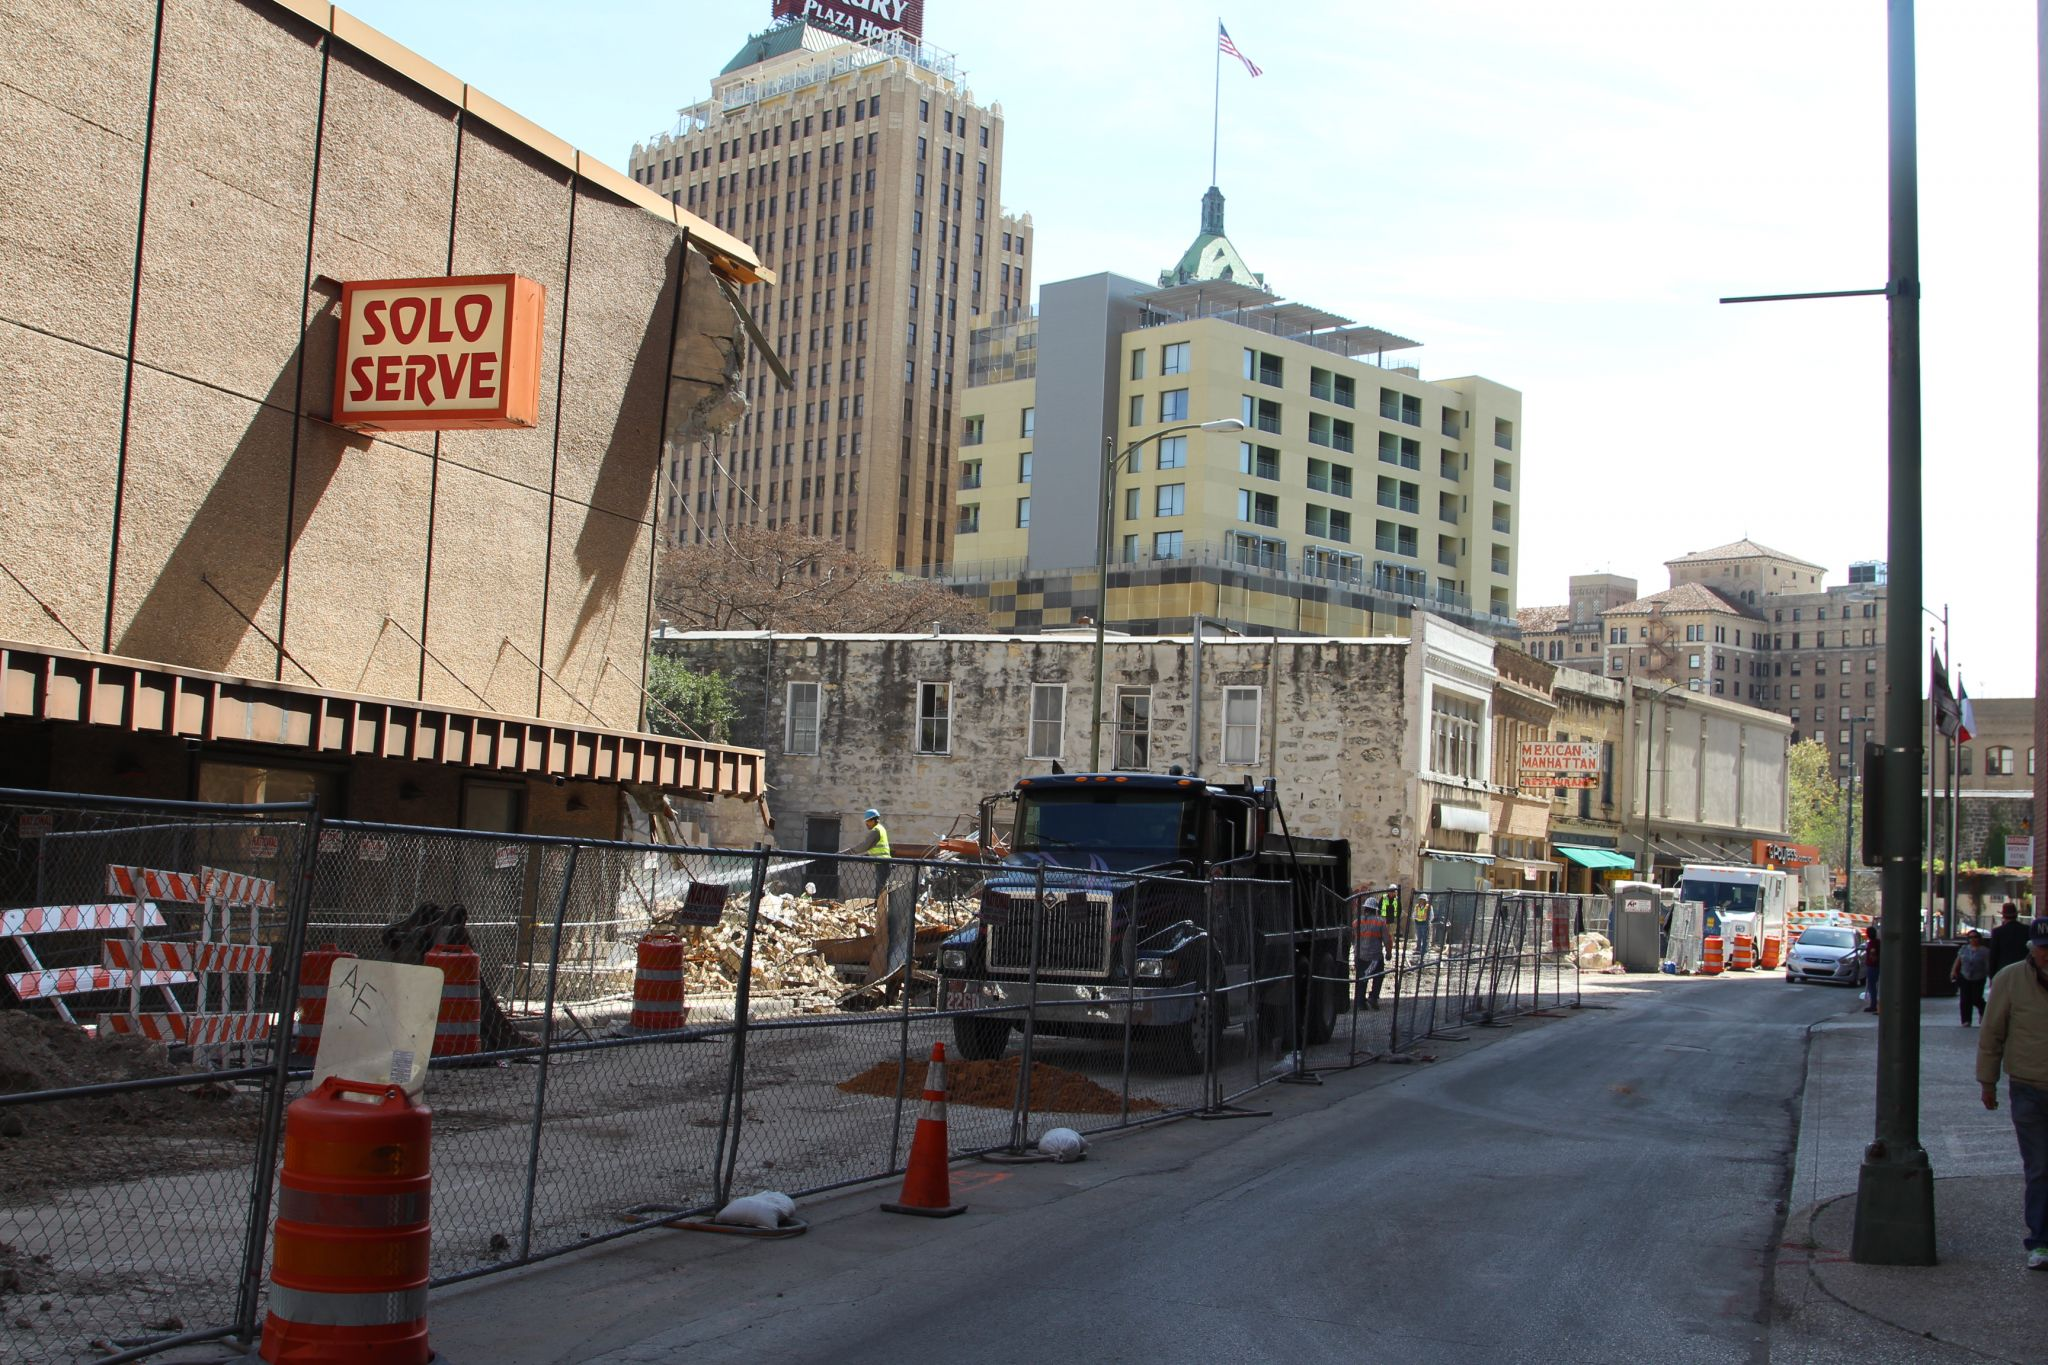 Historic Downtown Solo Serve Building Demolished Makes